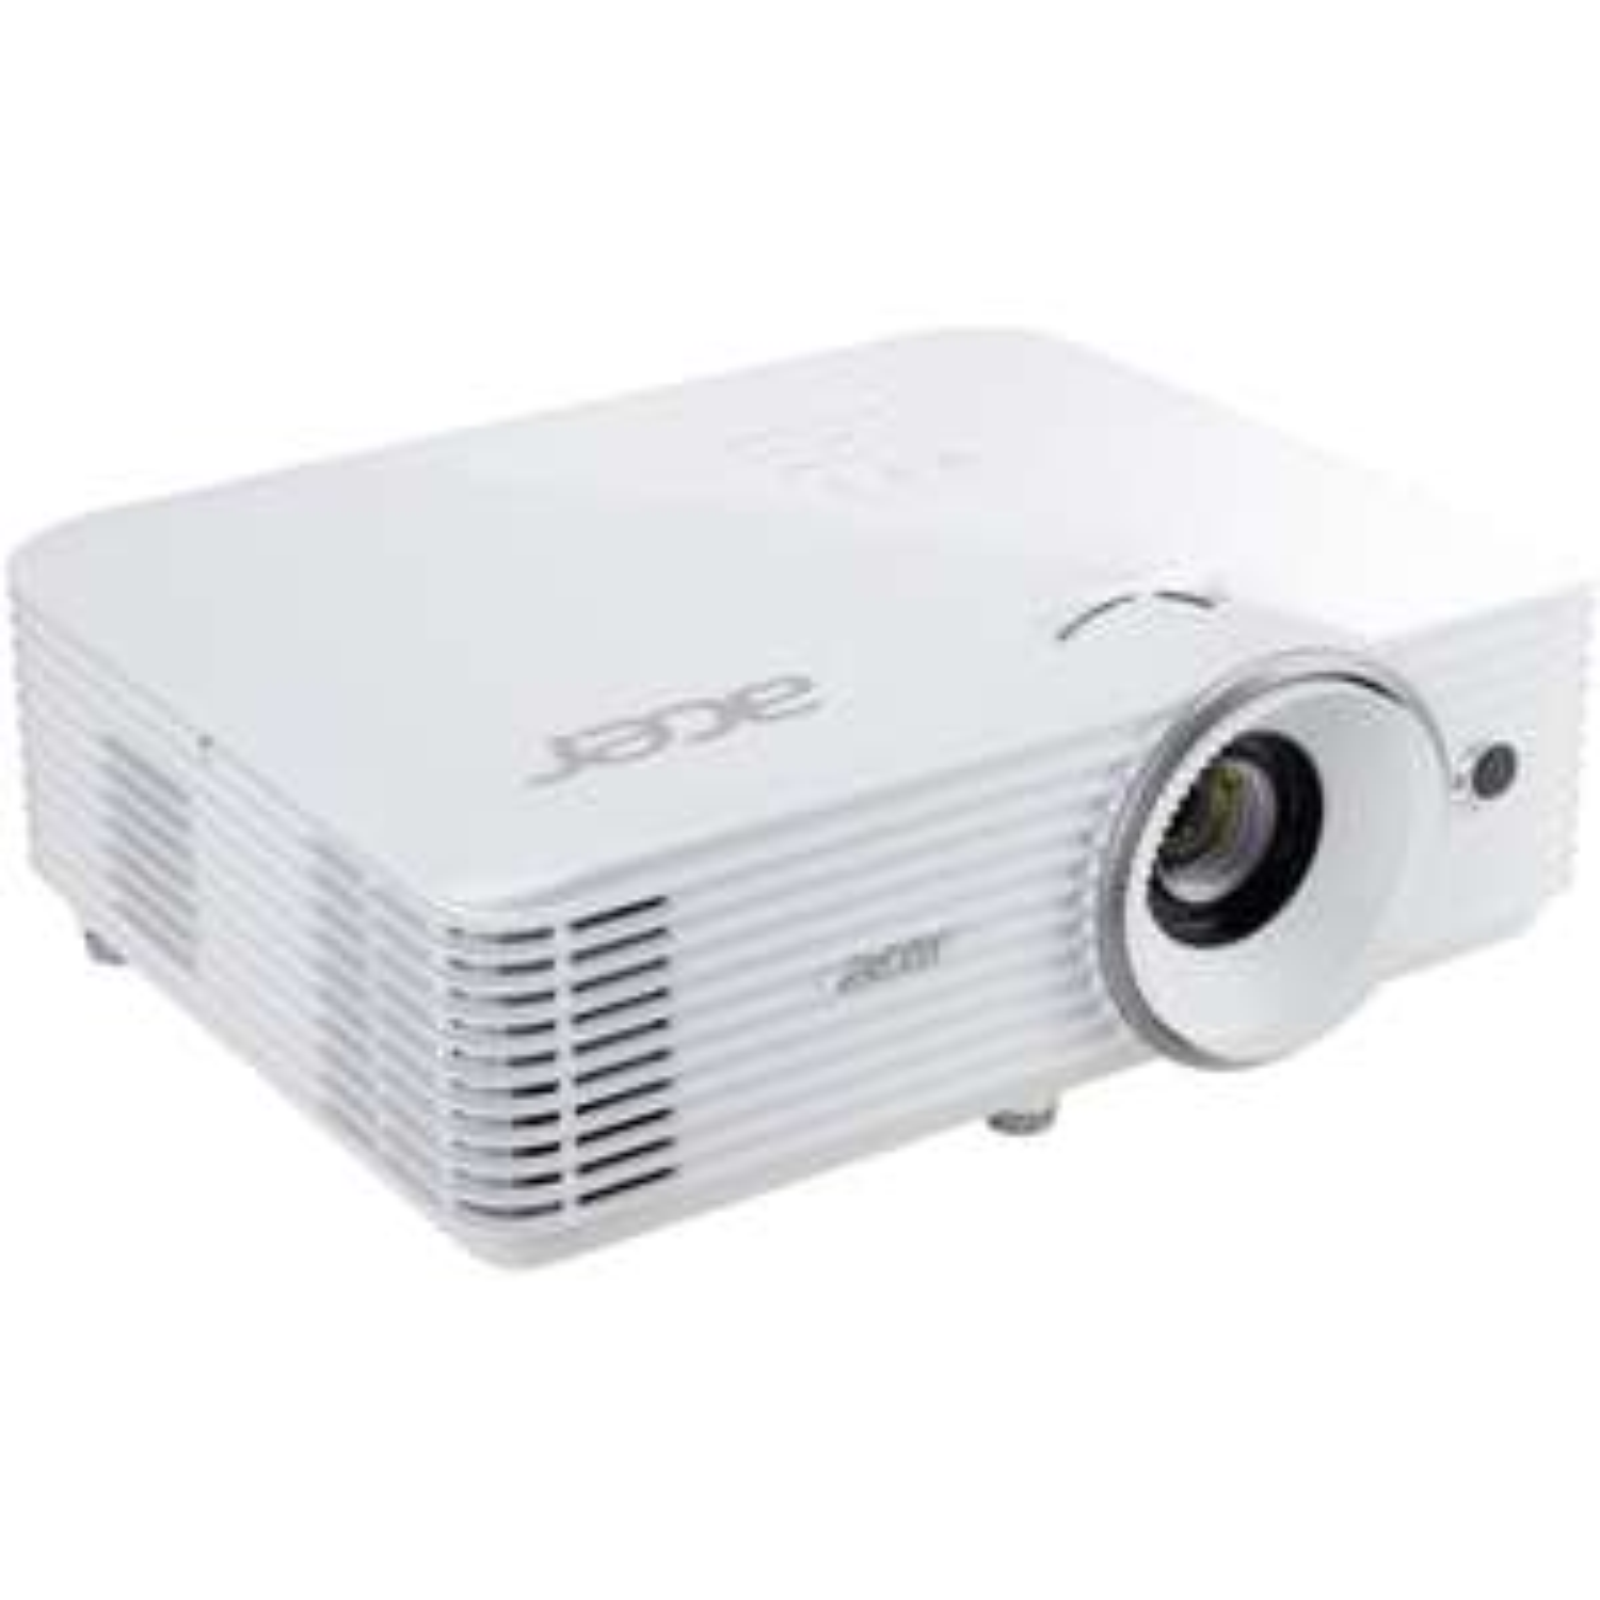 ACER H6521 ABD Full HD Beamer 3500 ANSI Lumen über [Mediamarkt @ eBay.com]